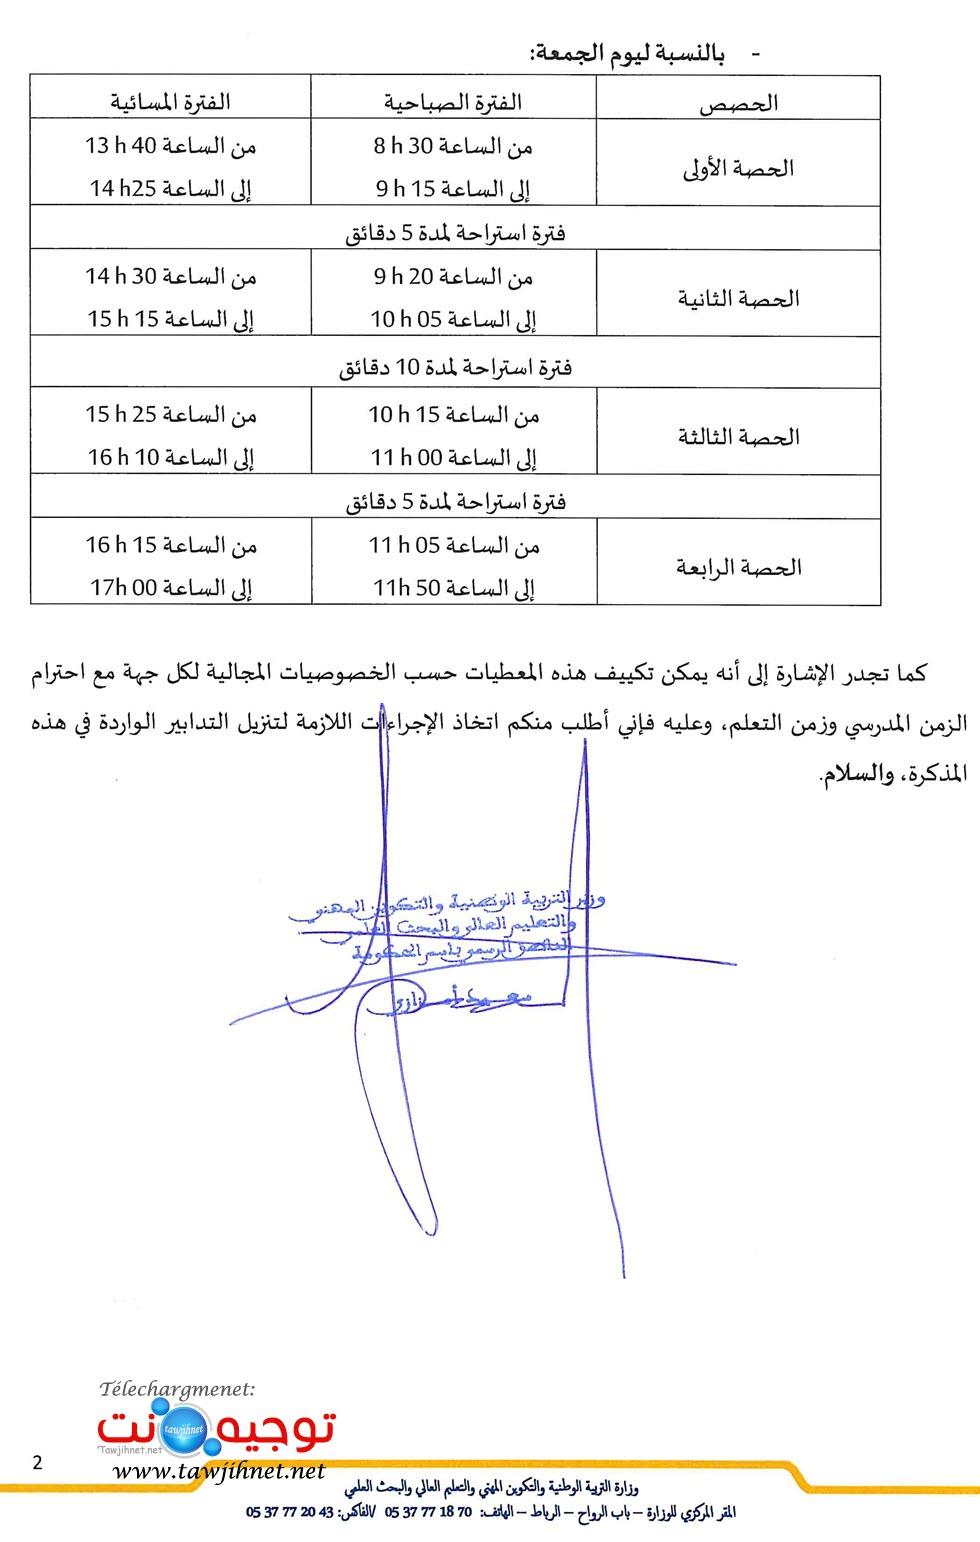 ramadan-Note-33-21-2021._Page_2.jpg